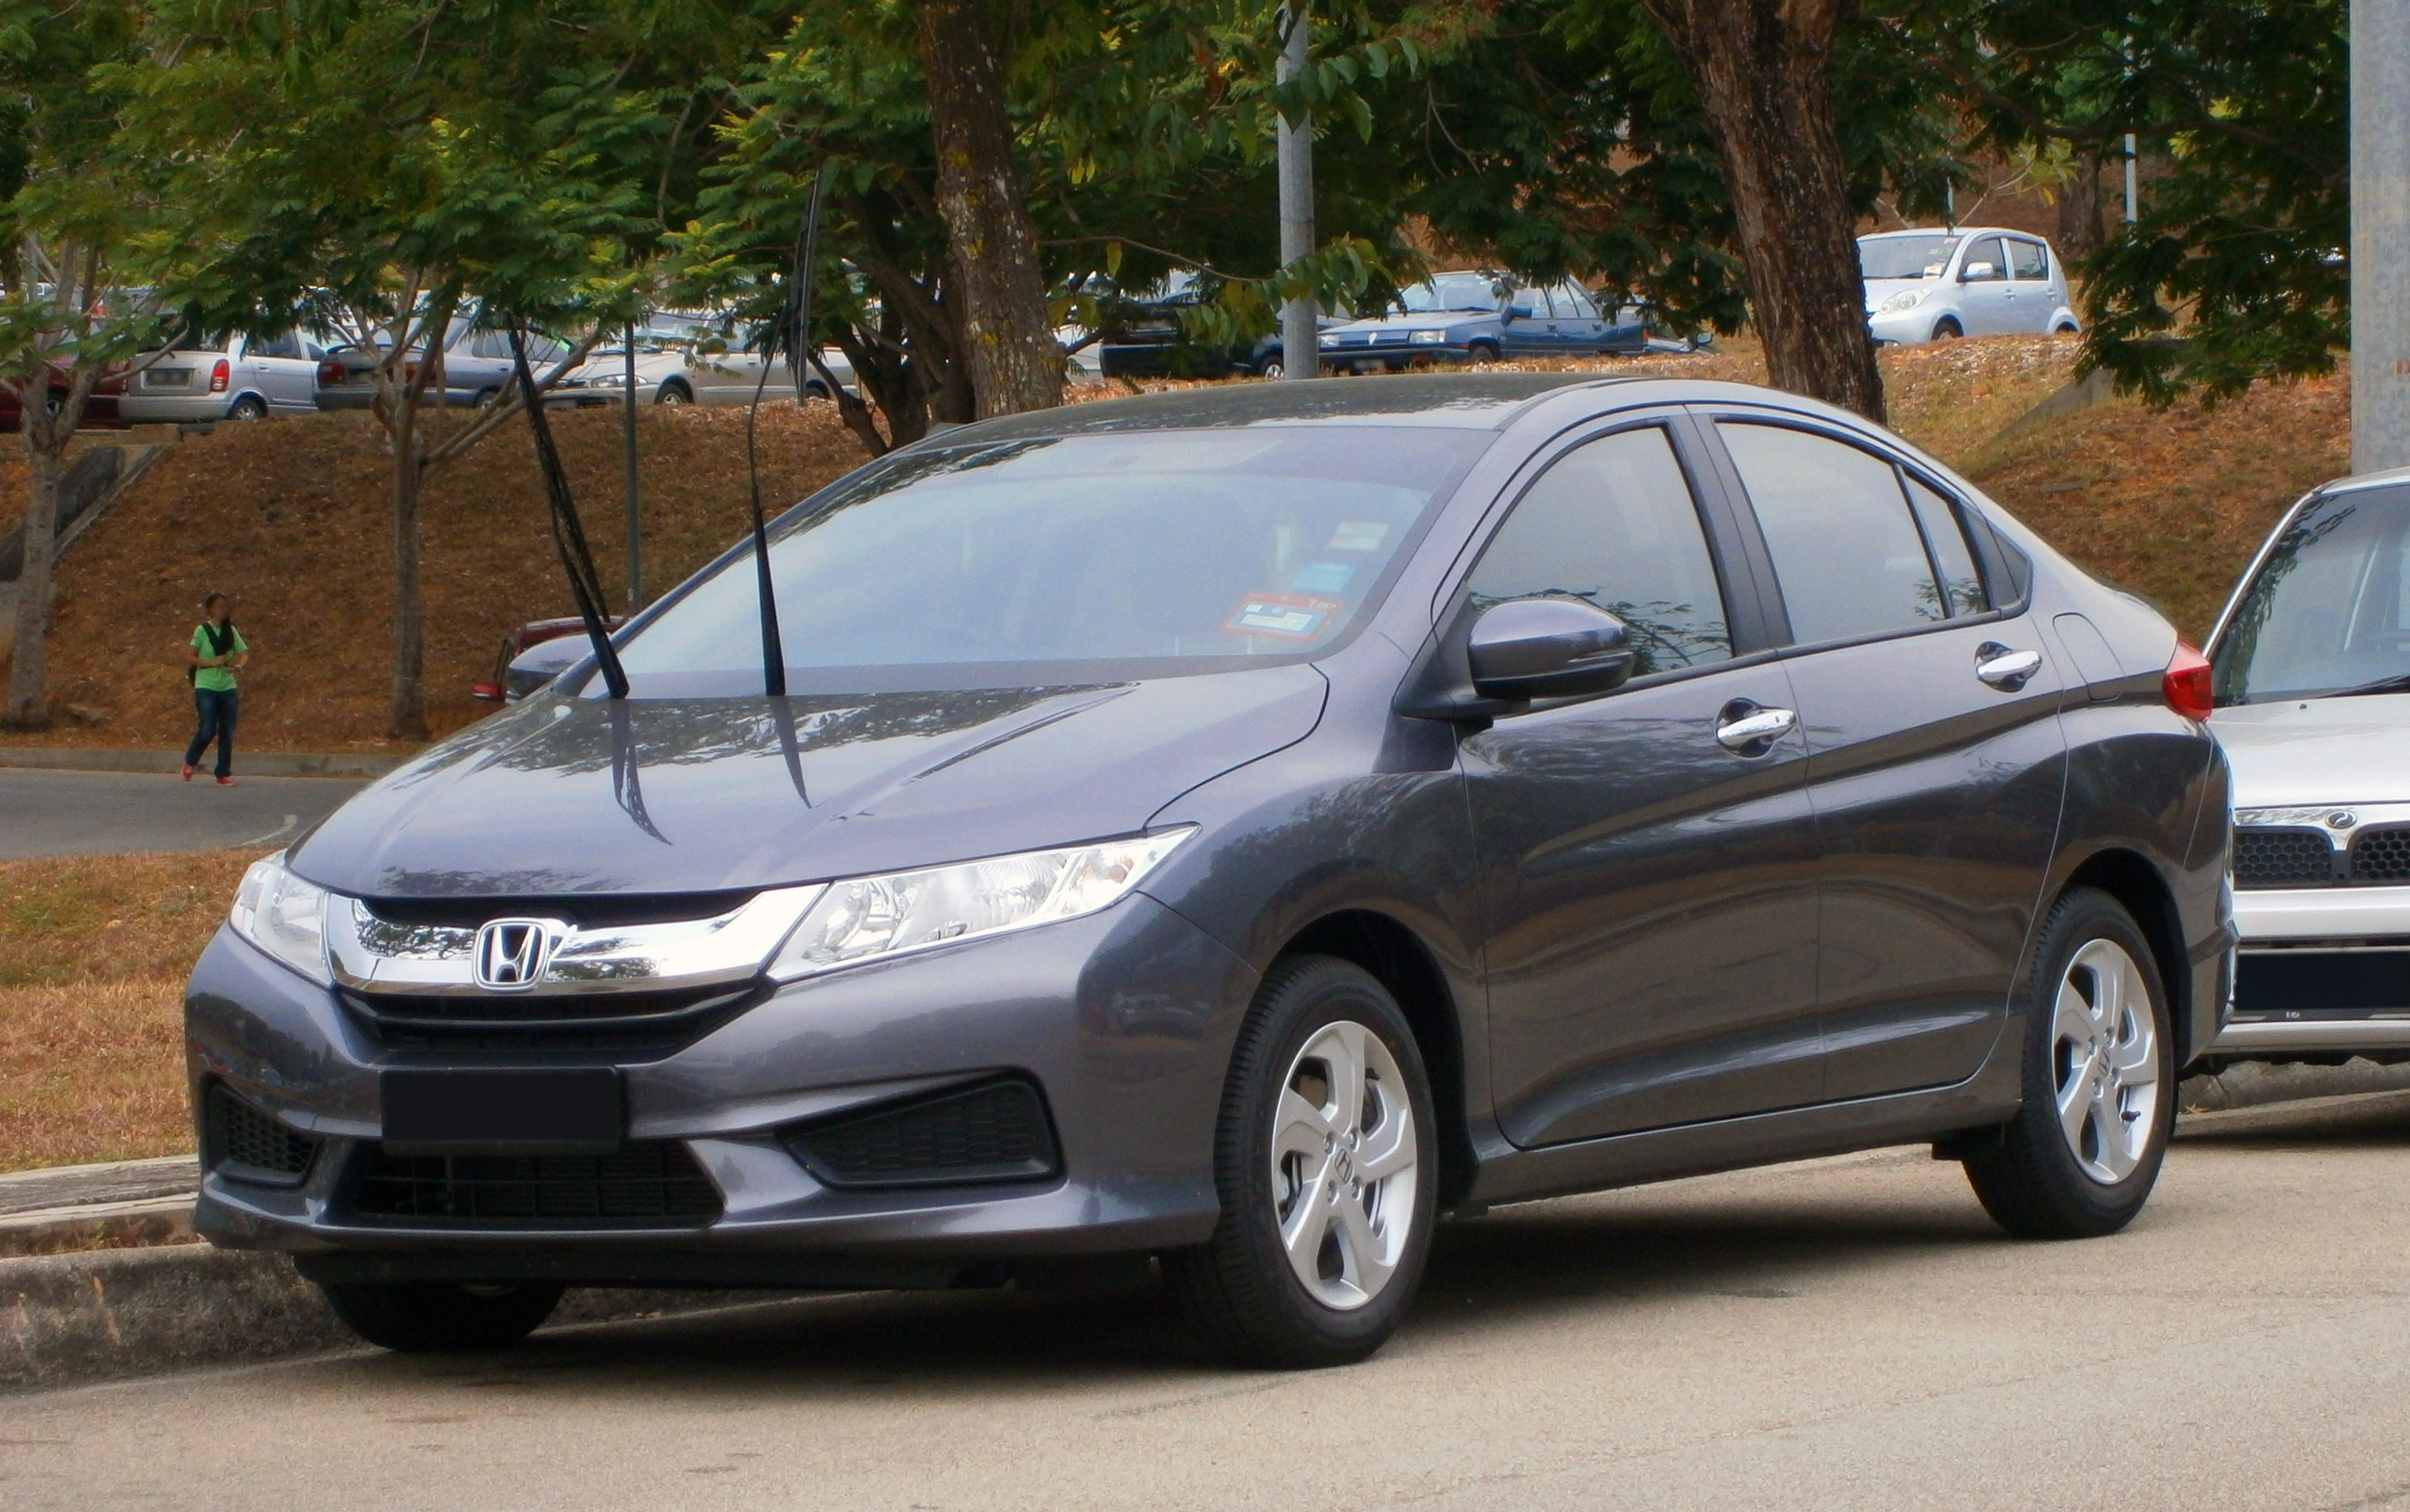 Honda+City+Malaysia Description 2014 Honda City 1.5L E in Cyberjaya